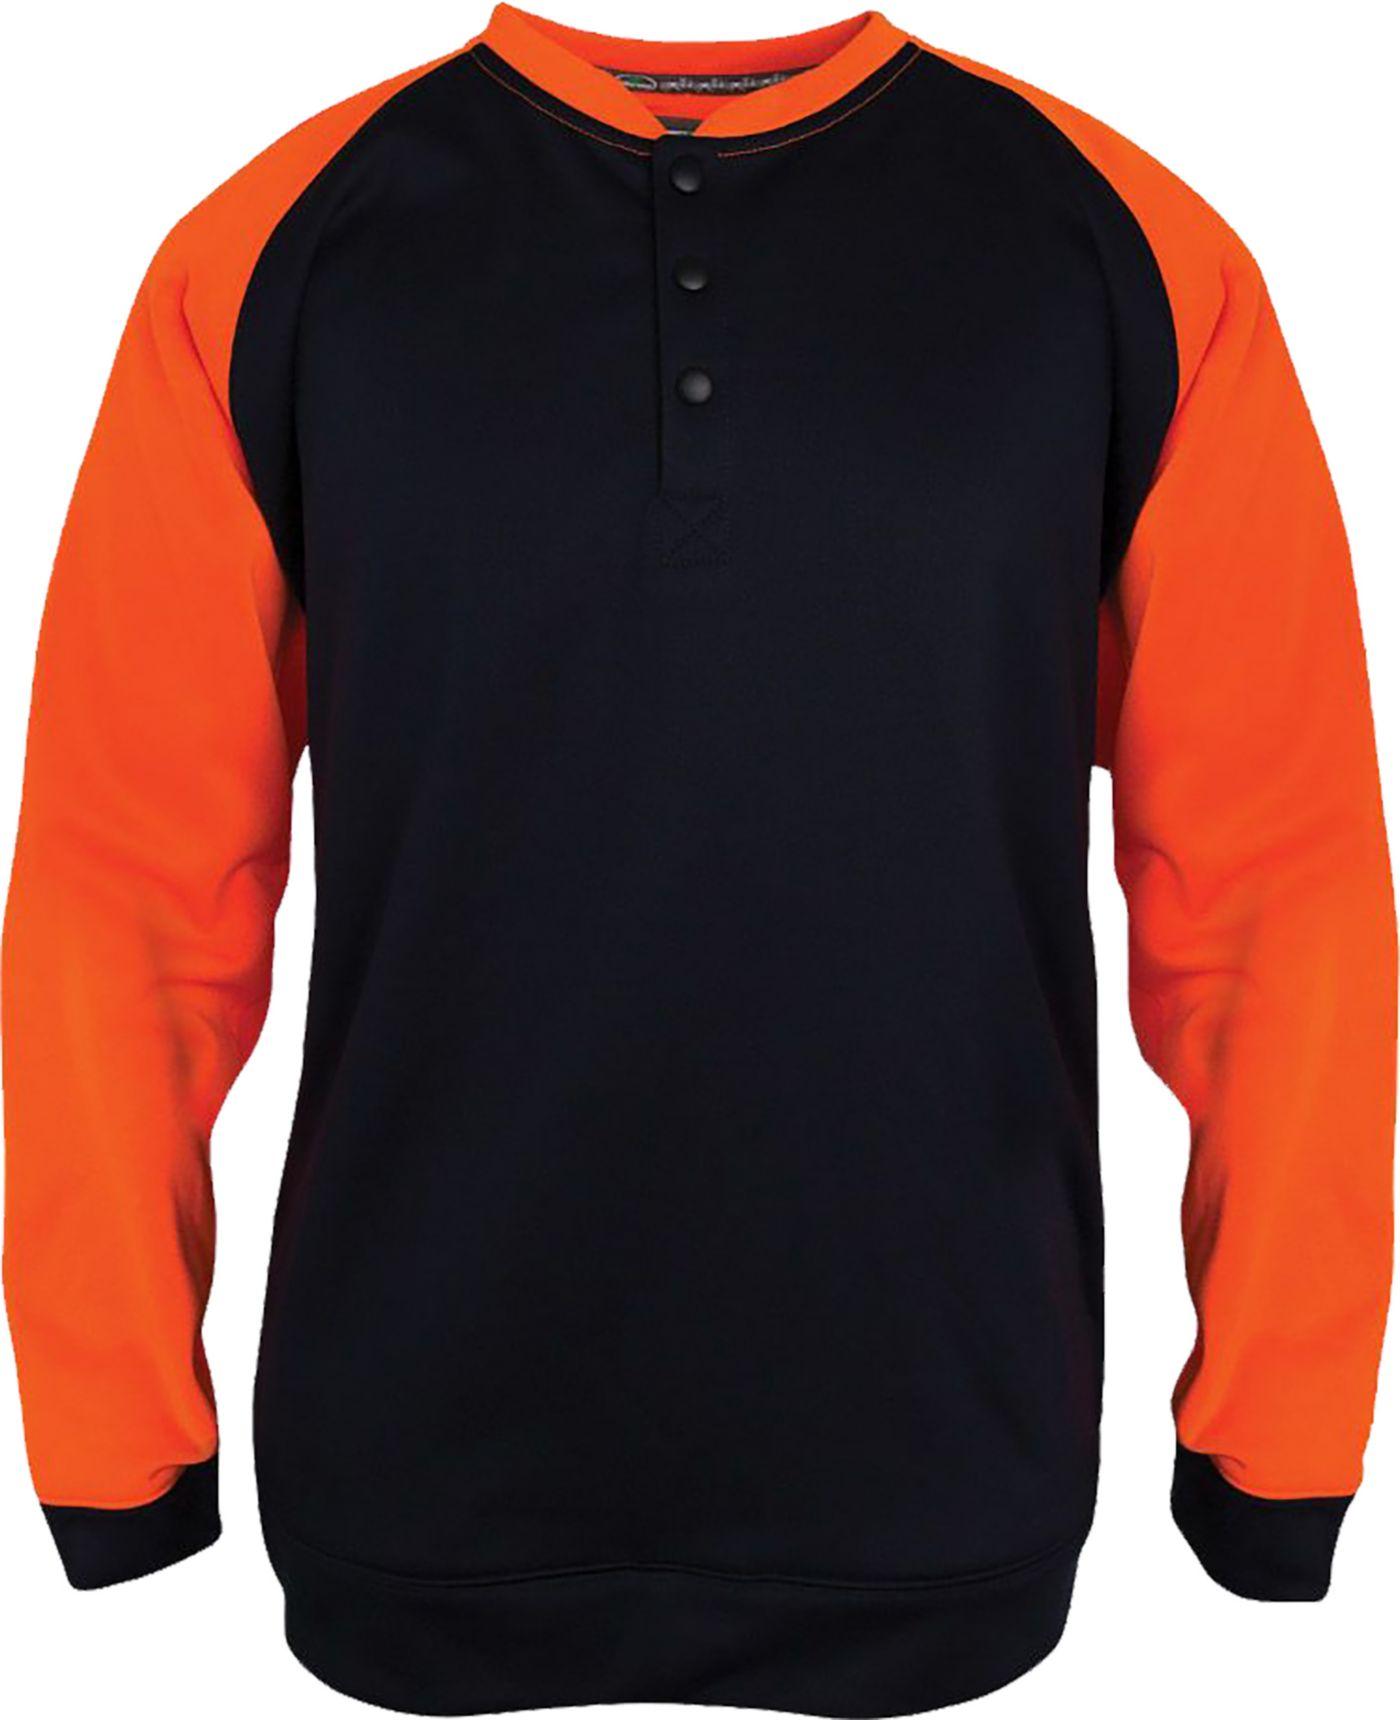 Arborwear Men's 2-Tone Tech Double Thick Henley Sweatshirt